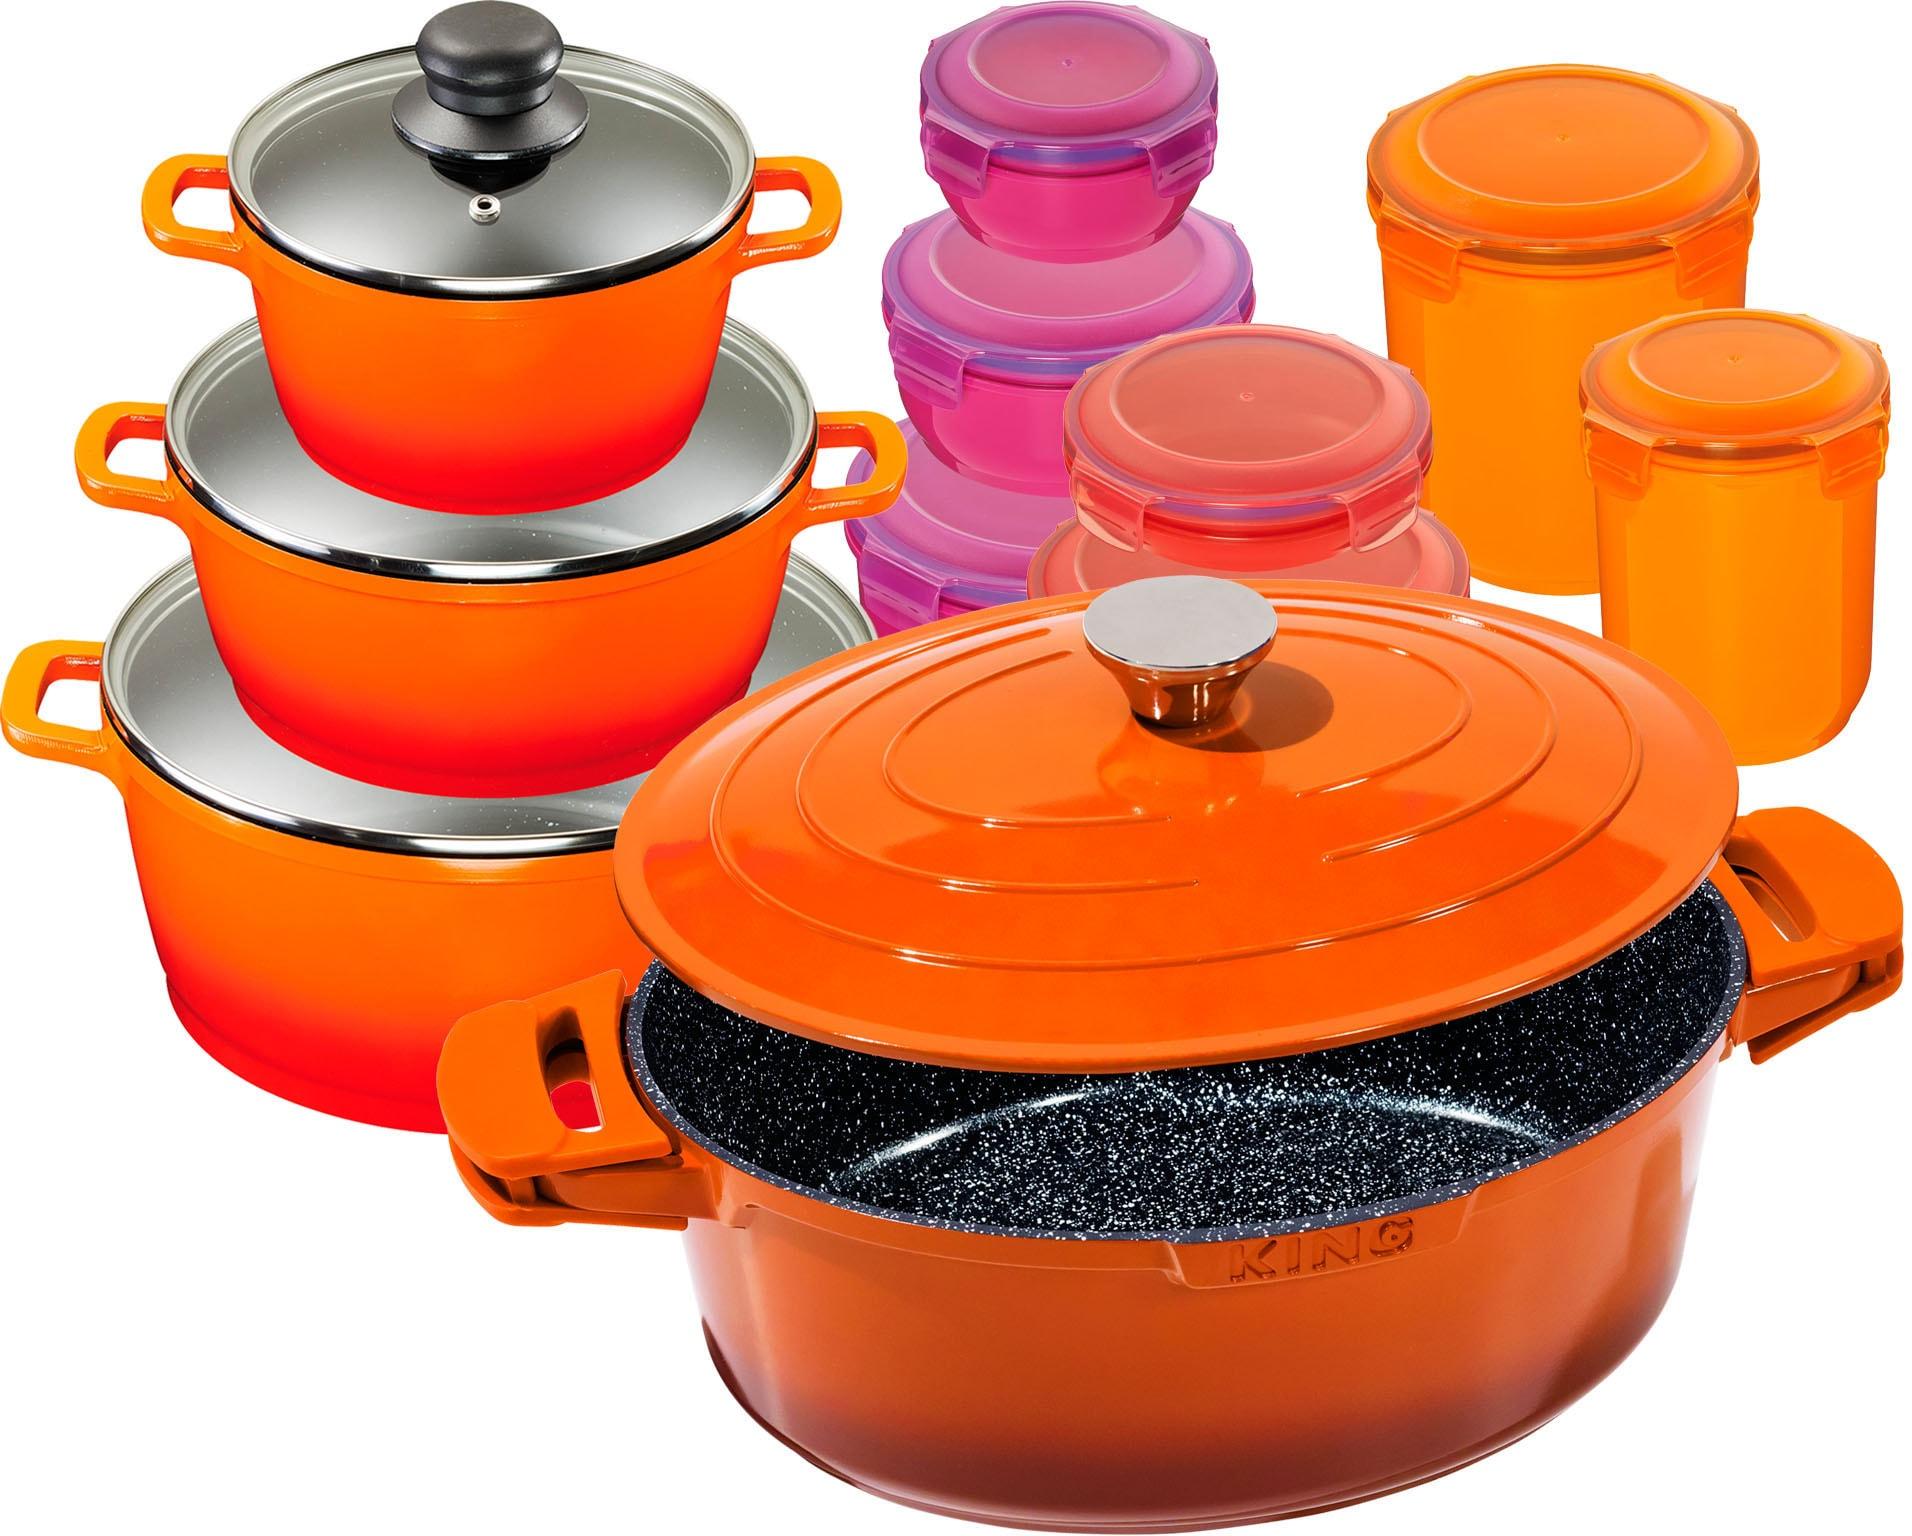 KING Topf-Set Orange (Set, 11-tlg., 3 Töpfe, Deckel, 1 Bräter m. 7 Dosen) orange Topfsets Töpfe Haushaltswaren Topf